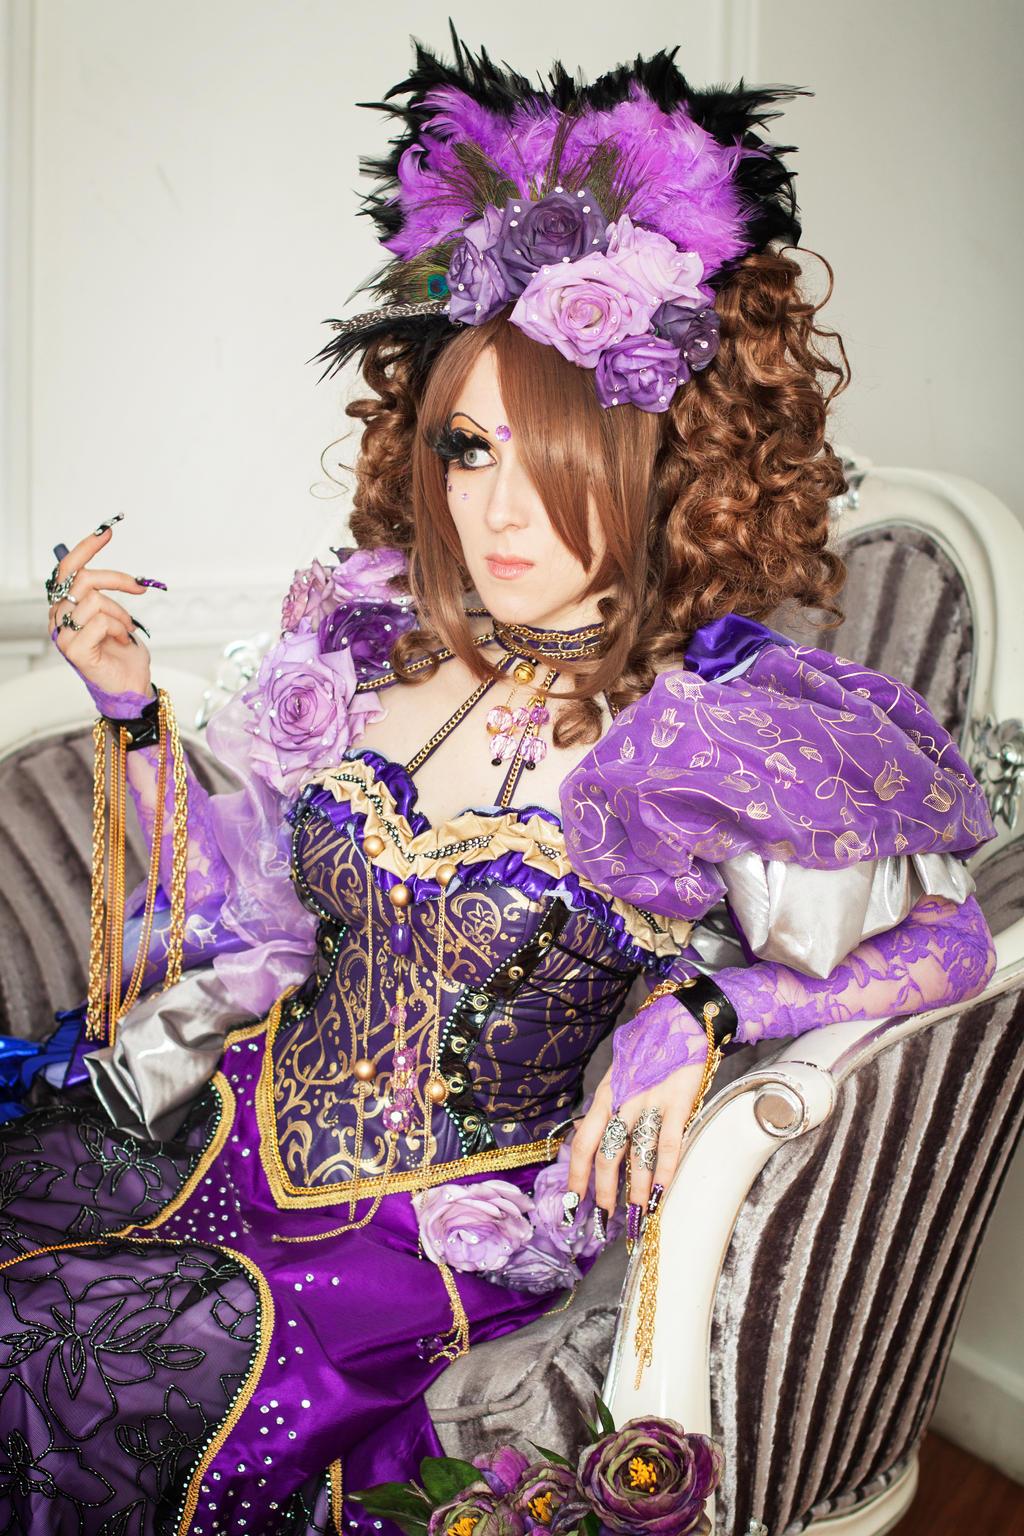 Jasmine You cosplay by Squalo-Superbia